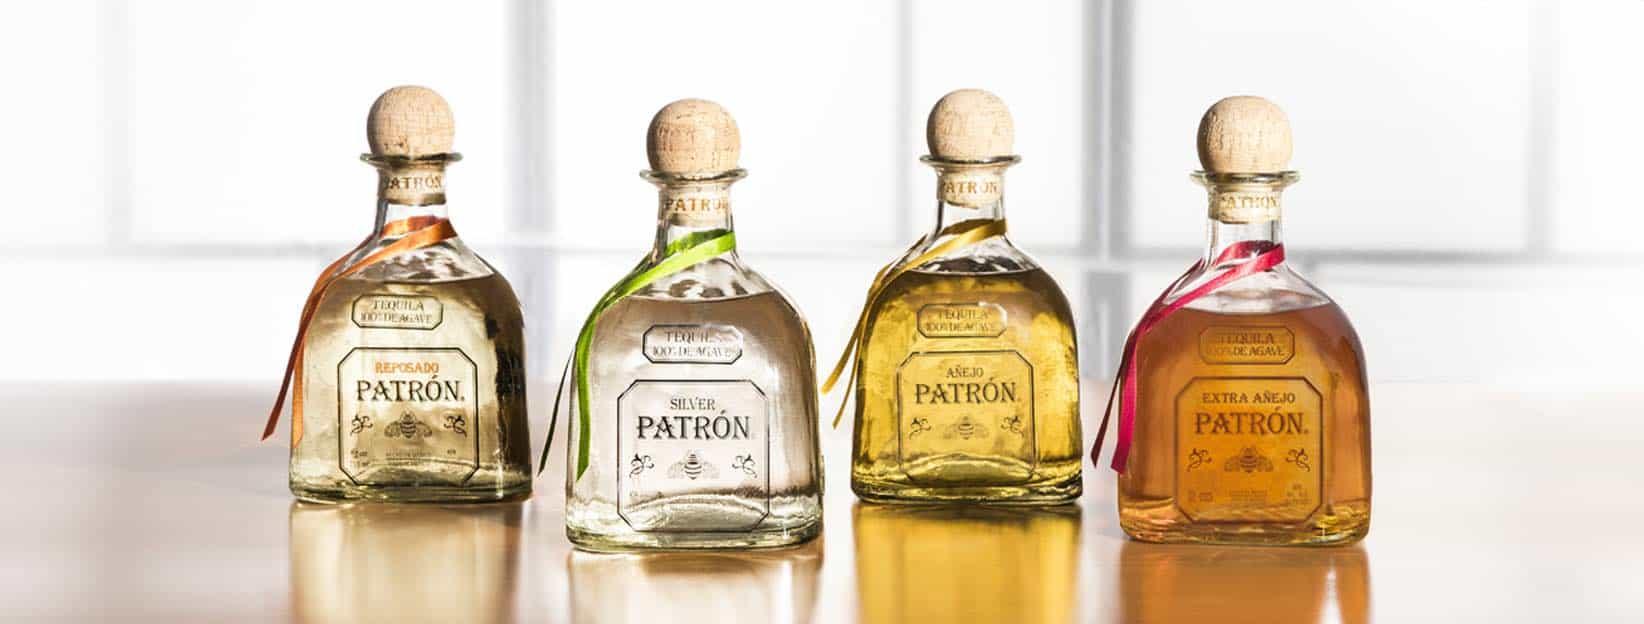 Patrón Tequila